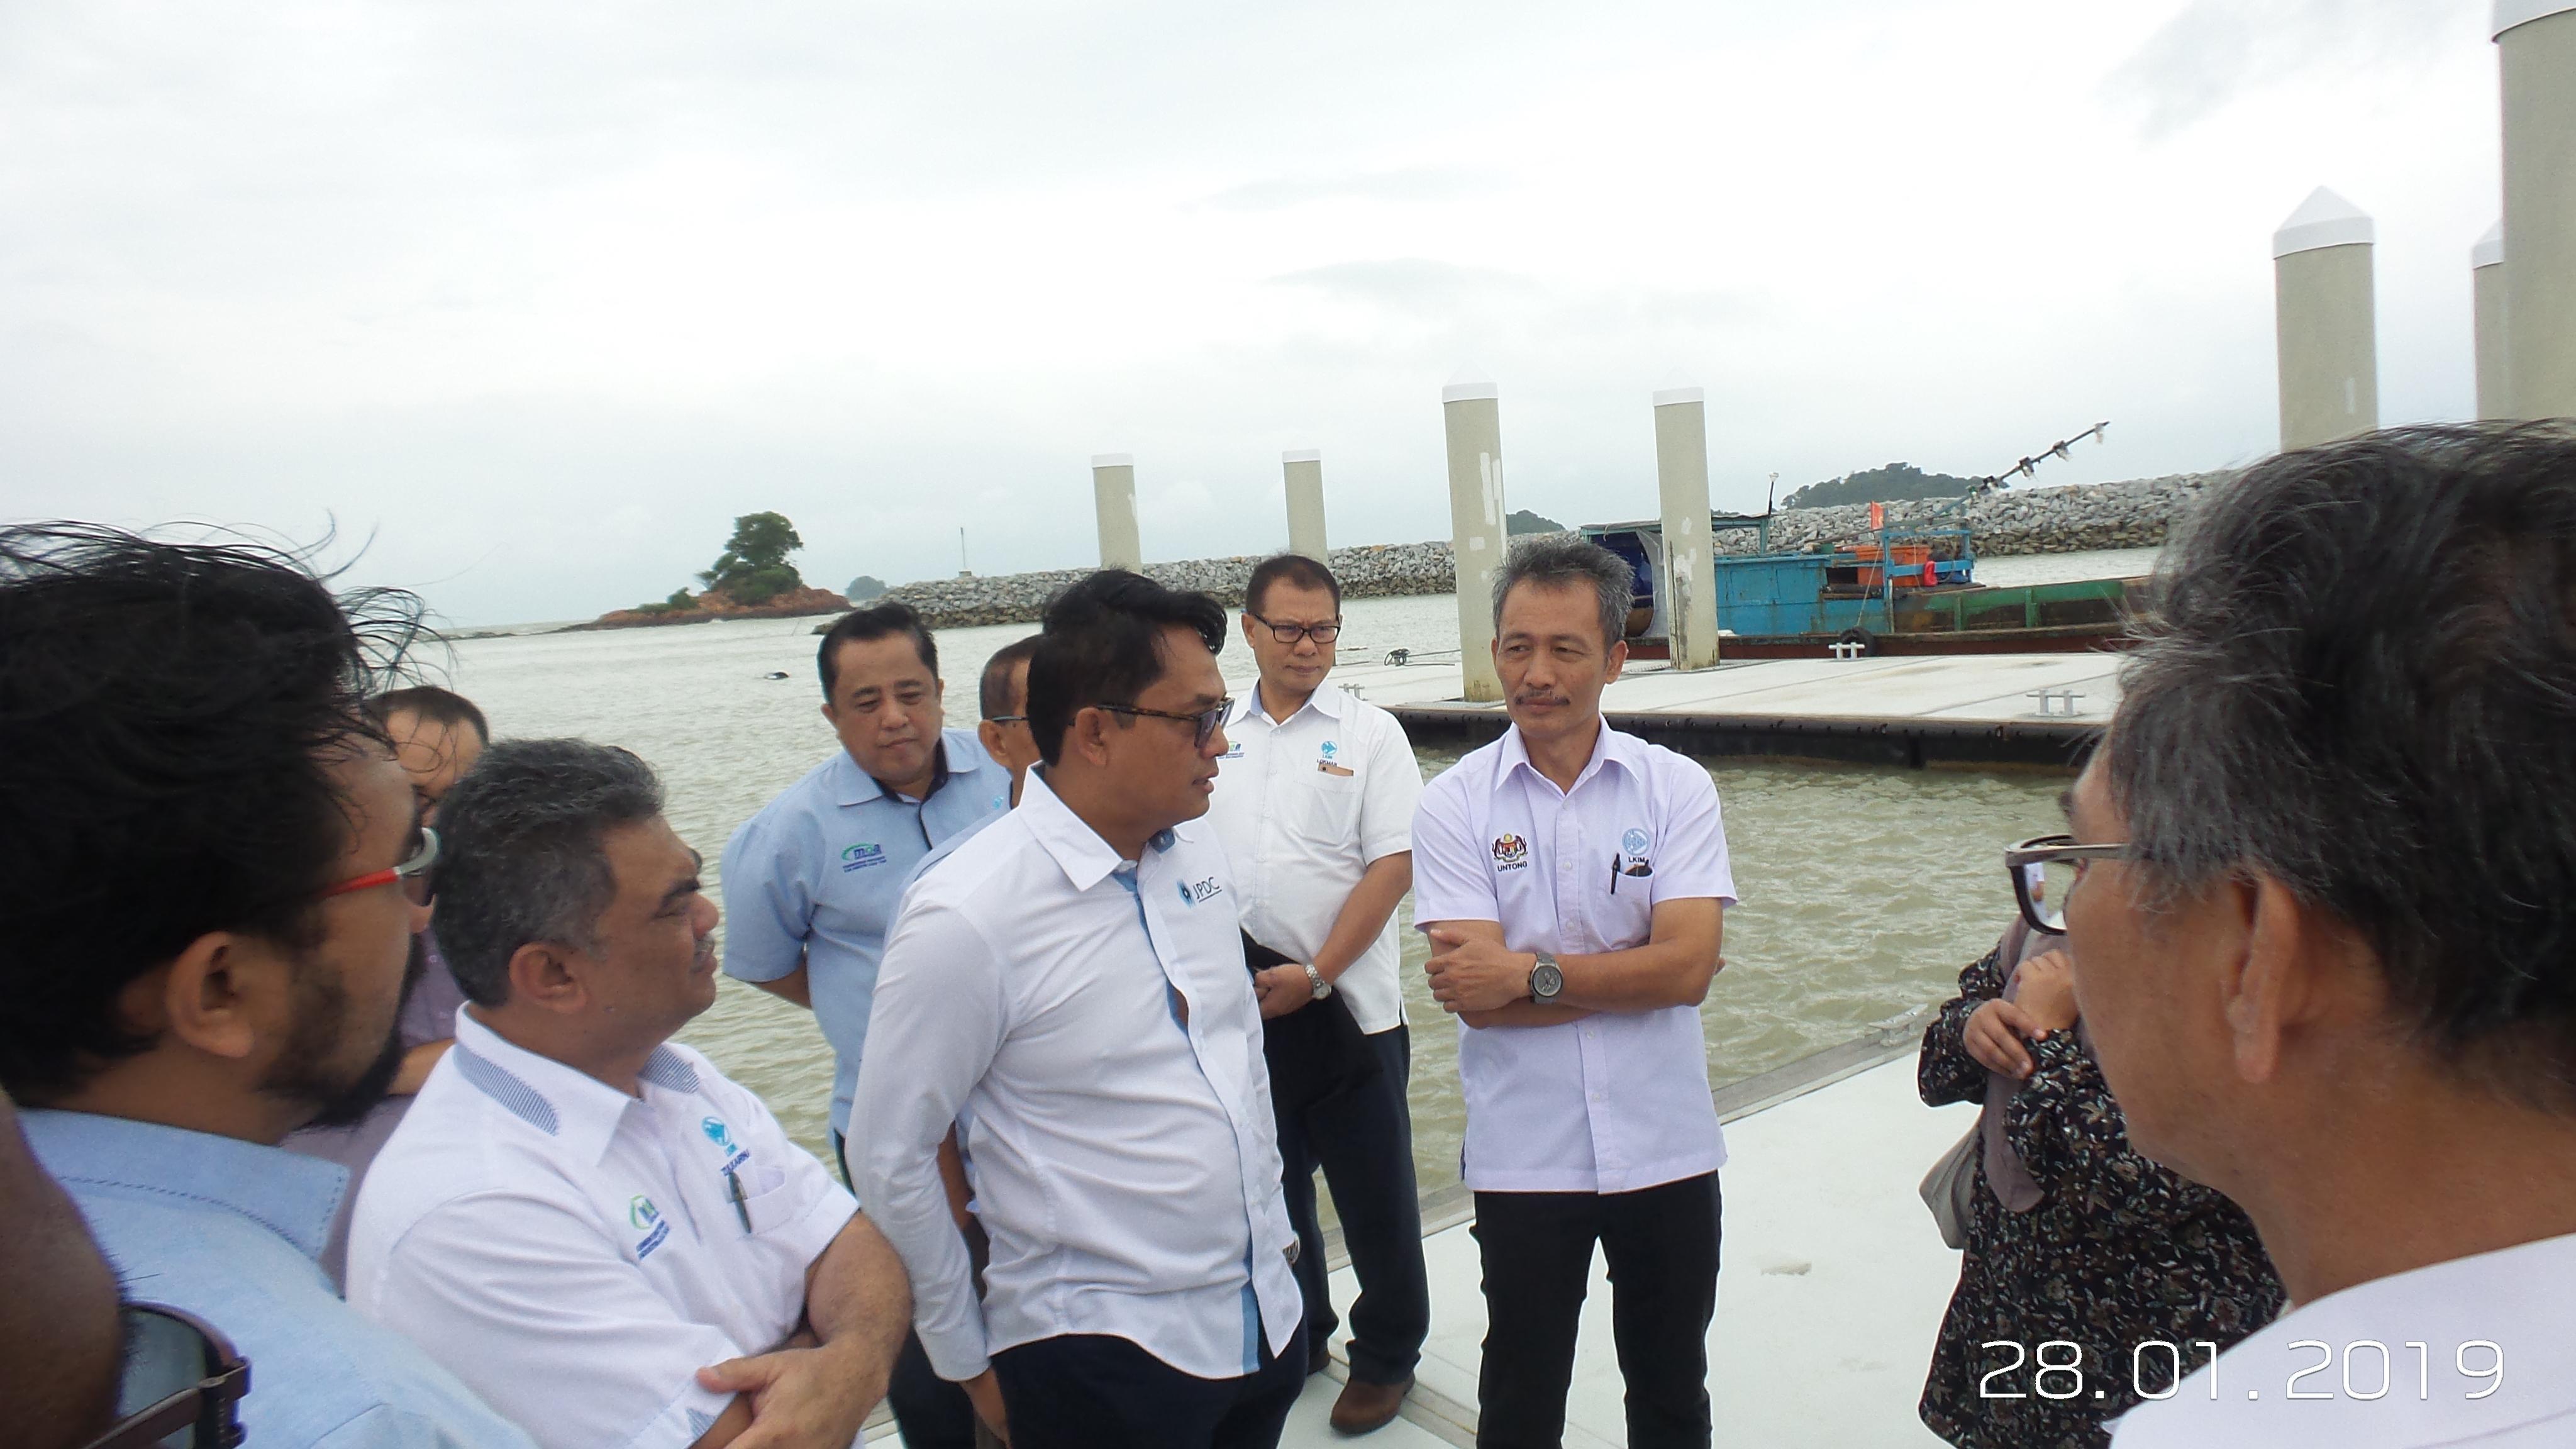 Majlis Penyerahan Projek Pembinaan Kompleks Pendaratan Ikan LKIM dan Benteng Pemecah Ombak Pengerang